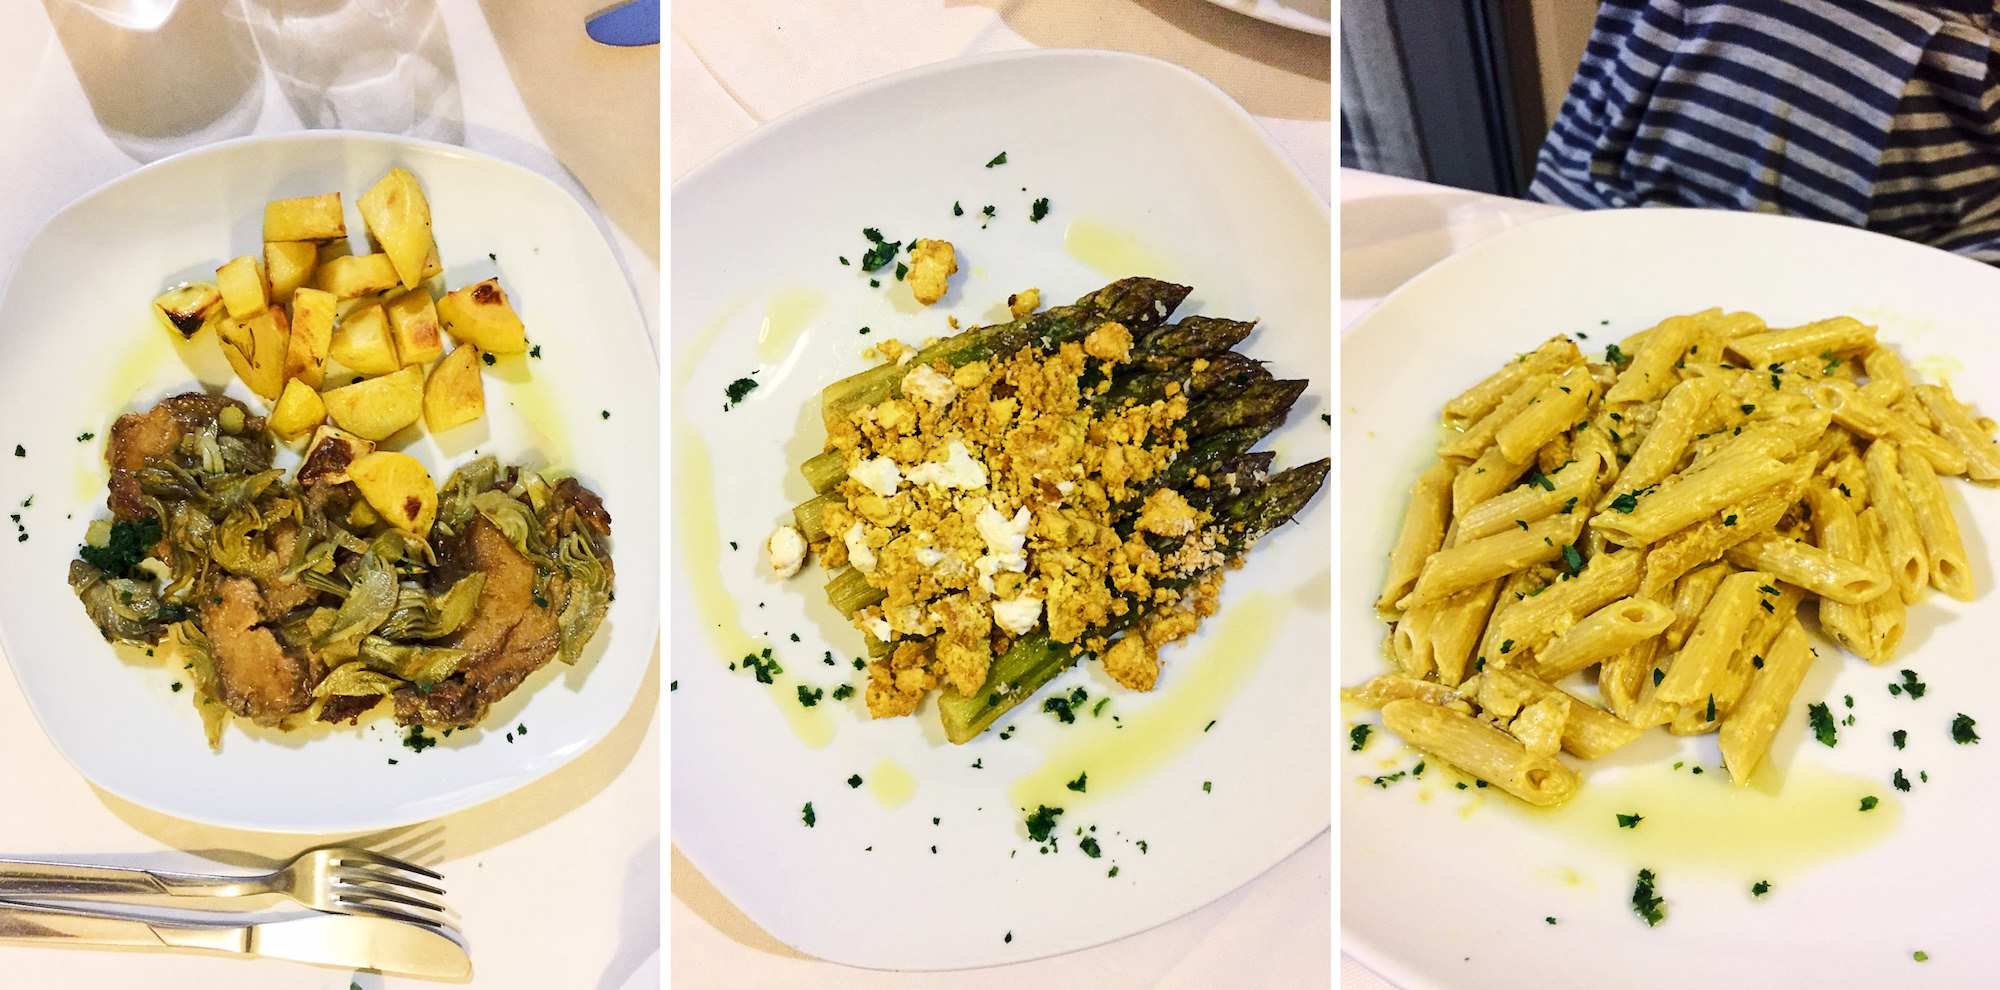 Turin: restaurant végétalien et bio Mezzaluna